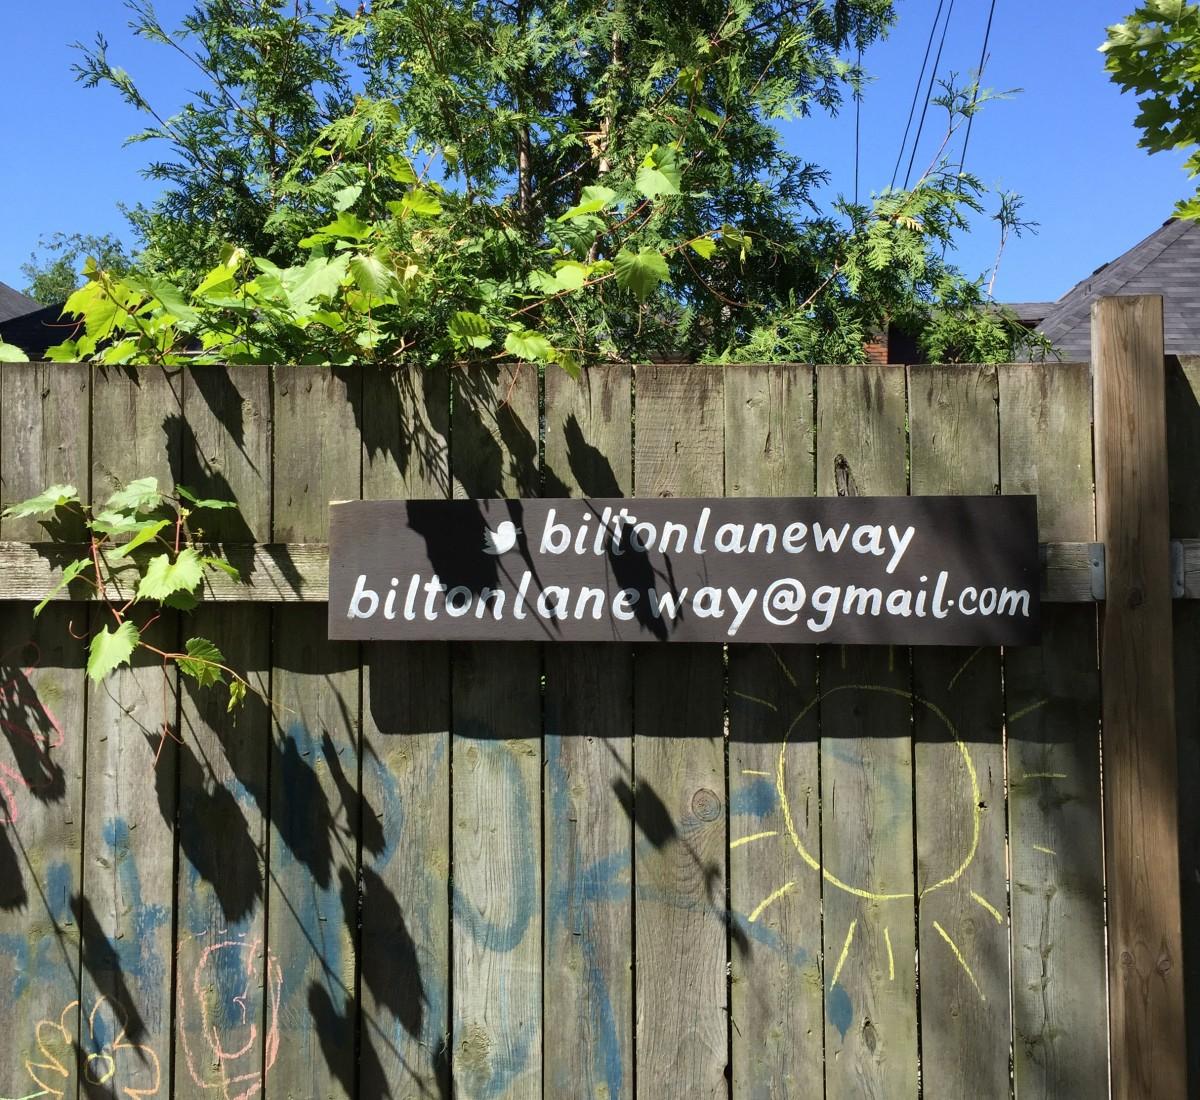 Bilton laneway sign on fence.